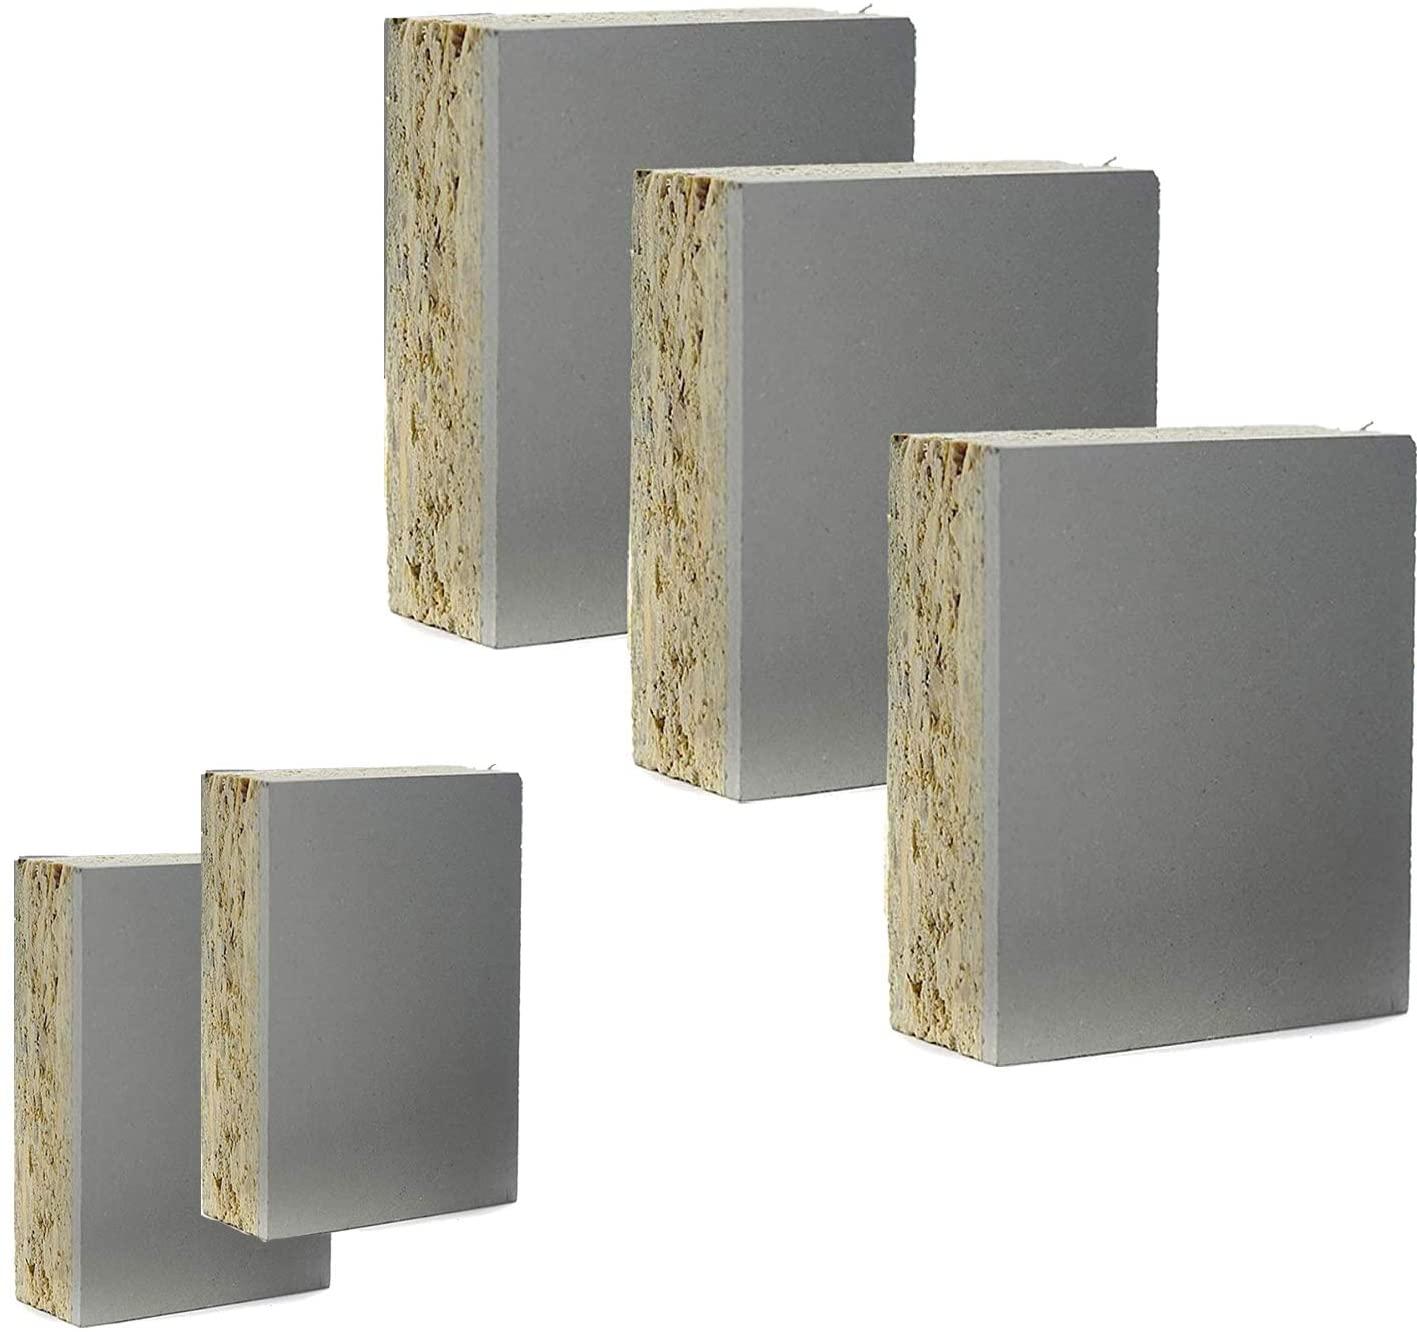 Gray Block Mounted Carve Linoleum Studio Print Plate Cut Carving Plates 5-Pack Project Artist Printmaking Art Set Small Size